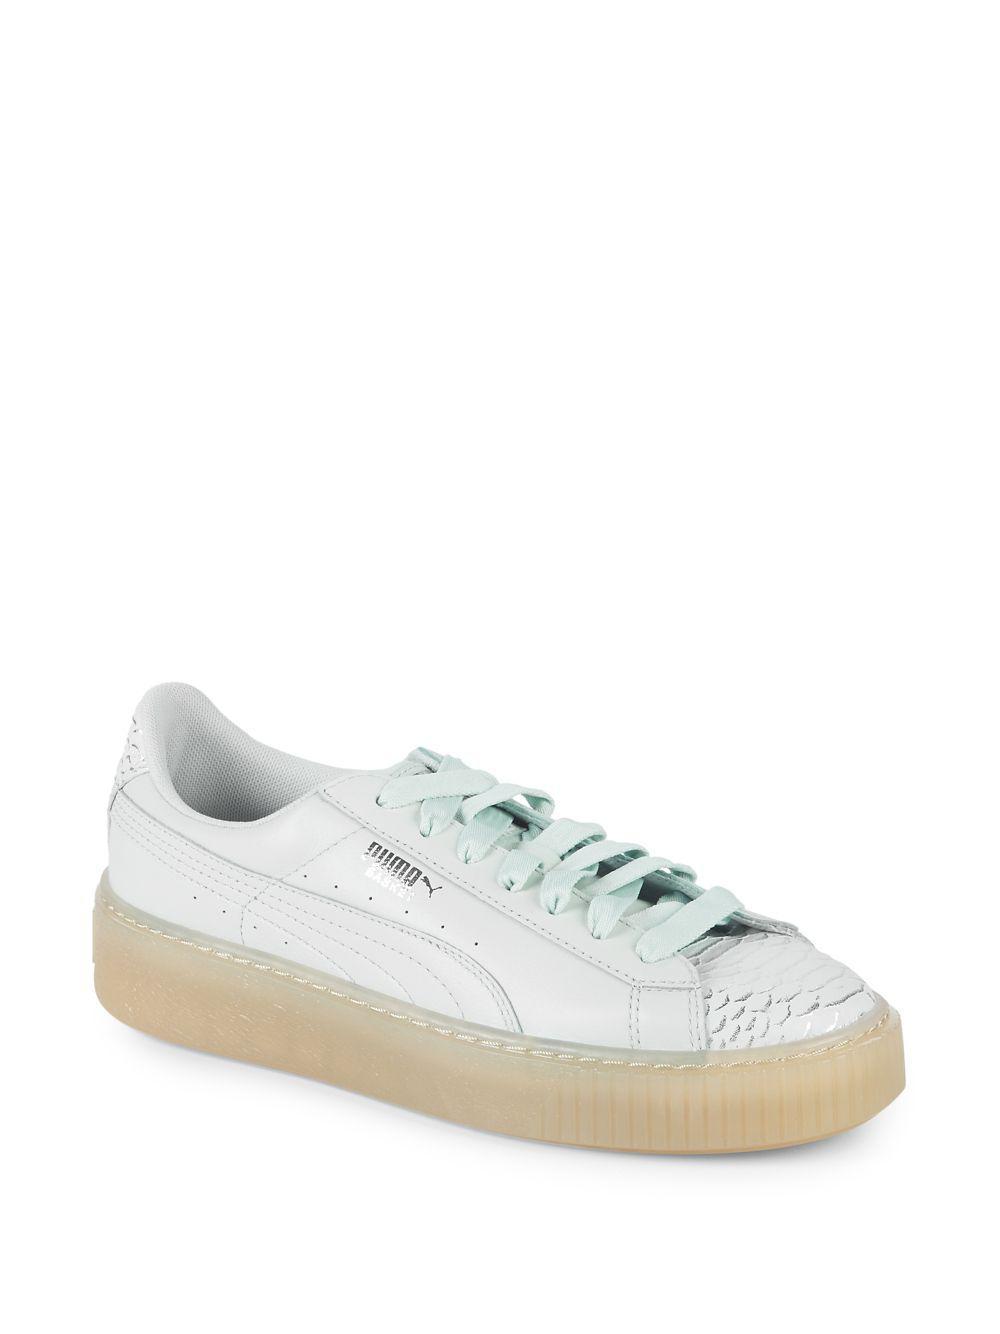 918537d89e0 Lyst - Puma Basket Platform Leather Sneakers in Blue